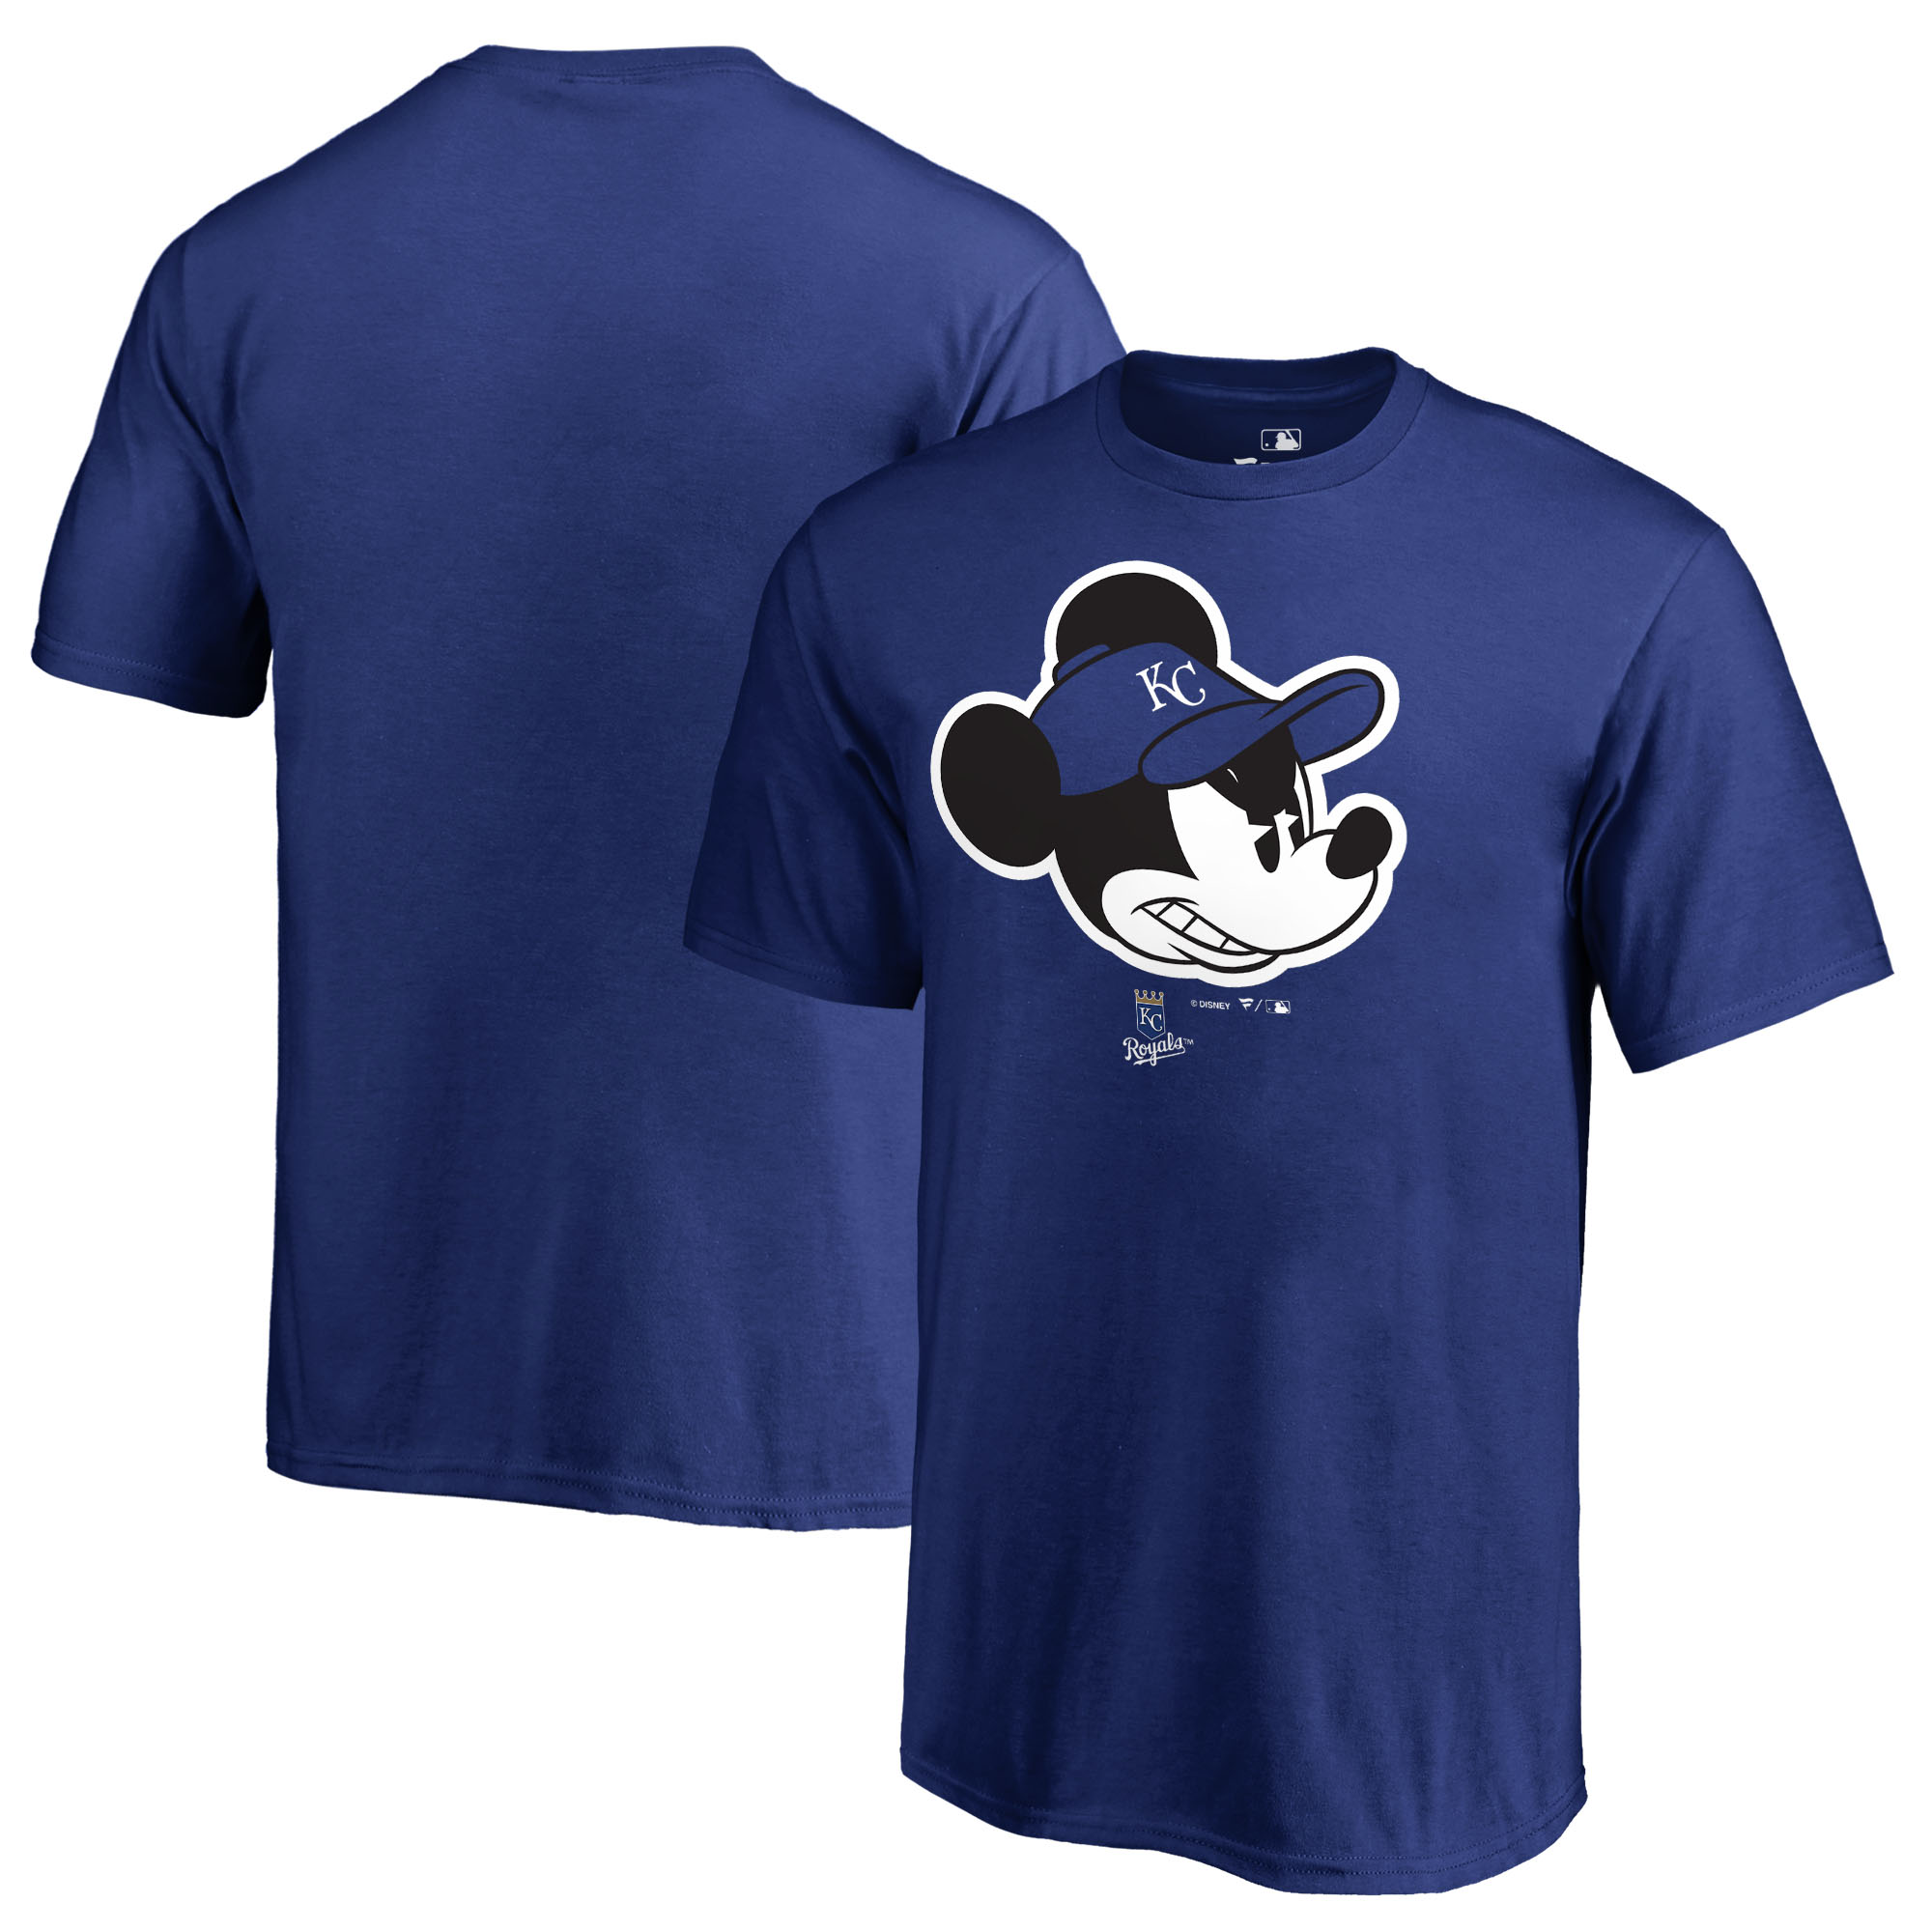 Kansas City Royals Fanatics Branded Youth Disney Game Face T-Shirt - Royal